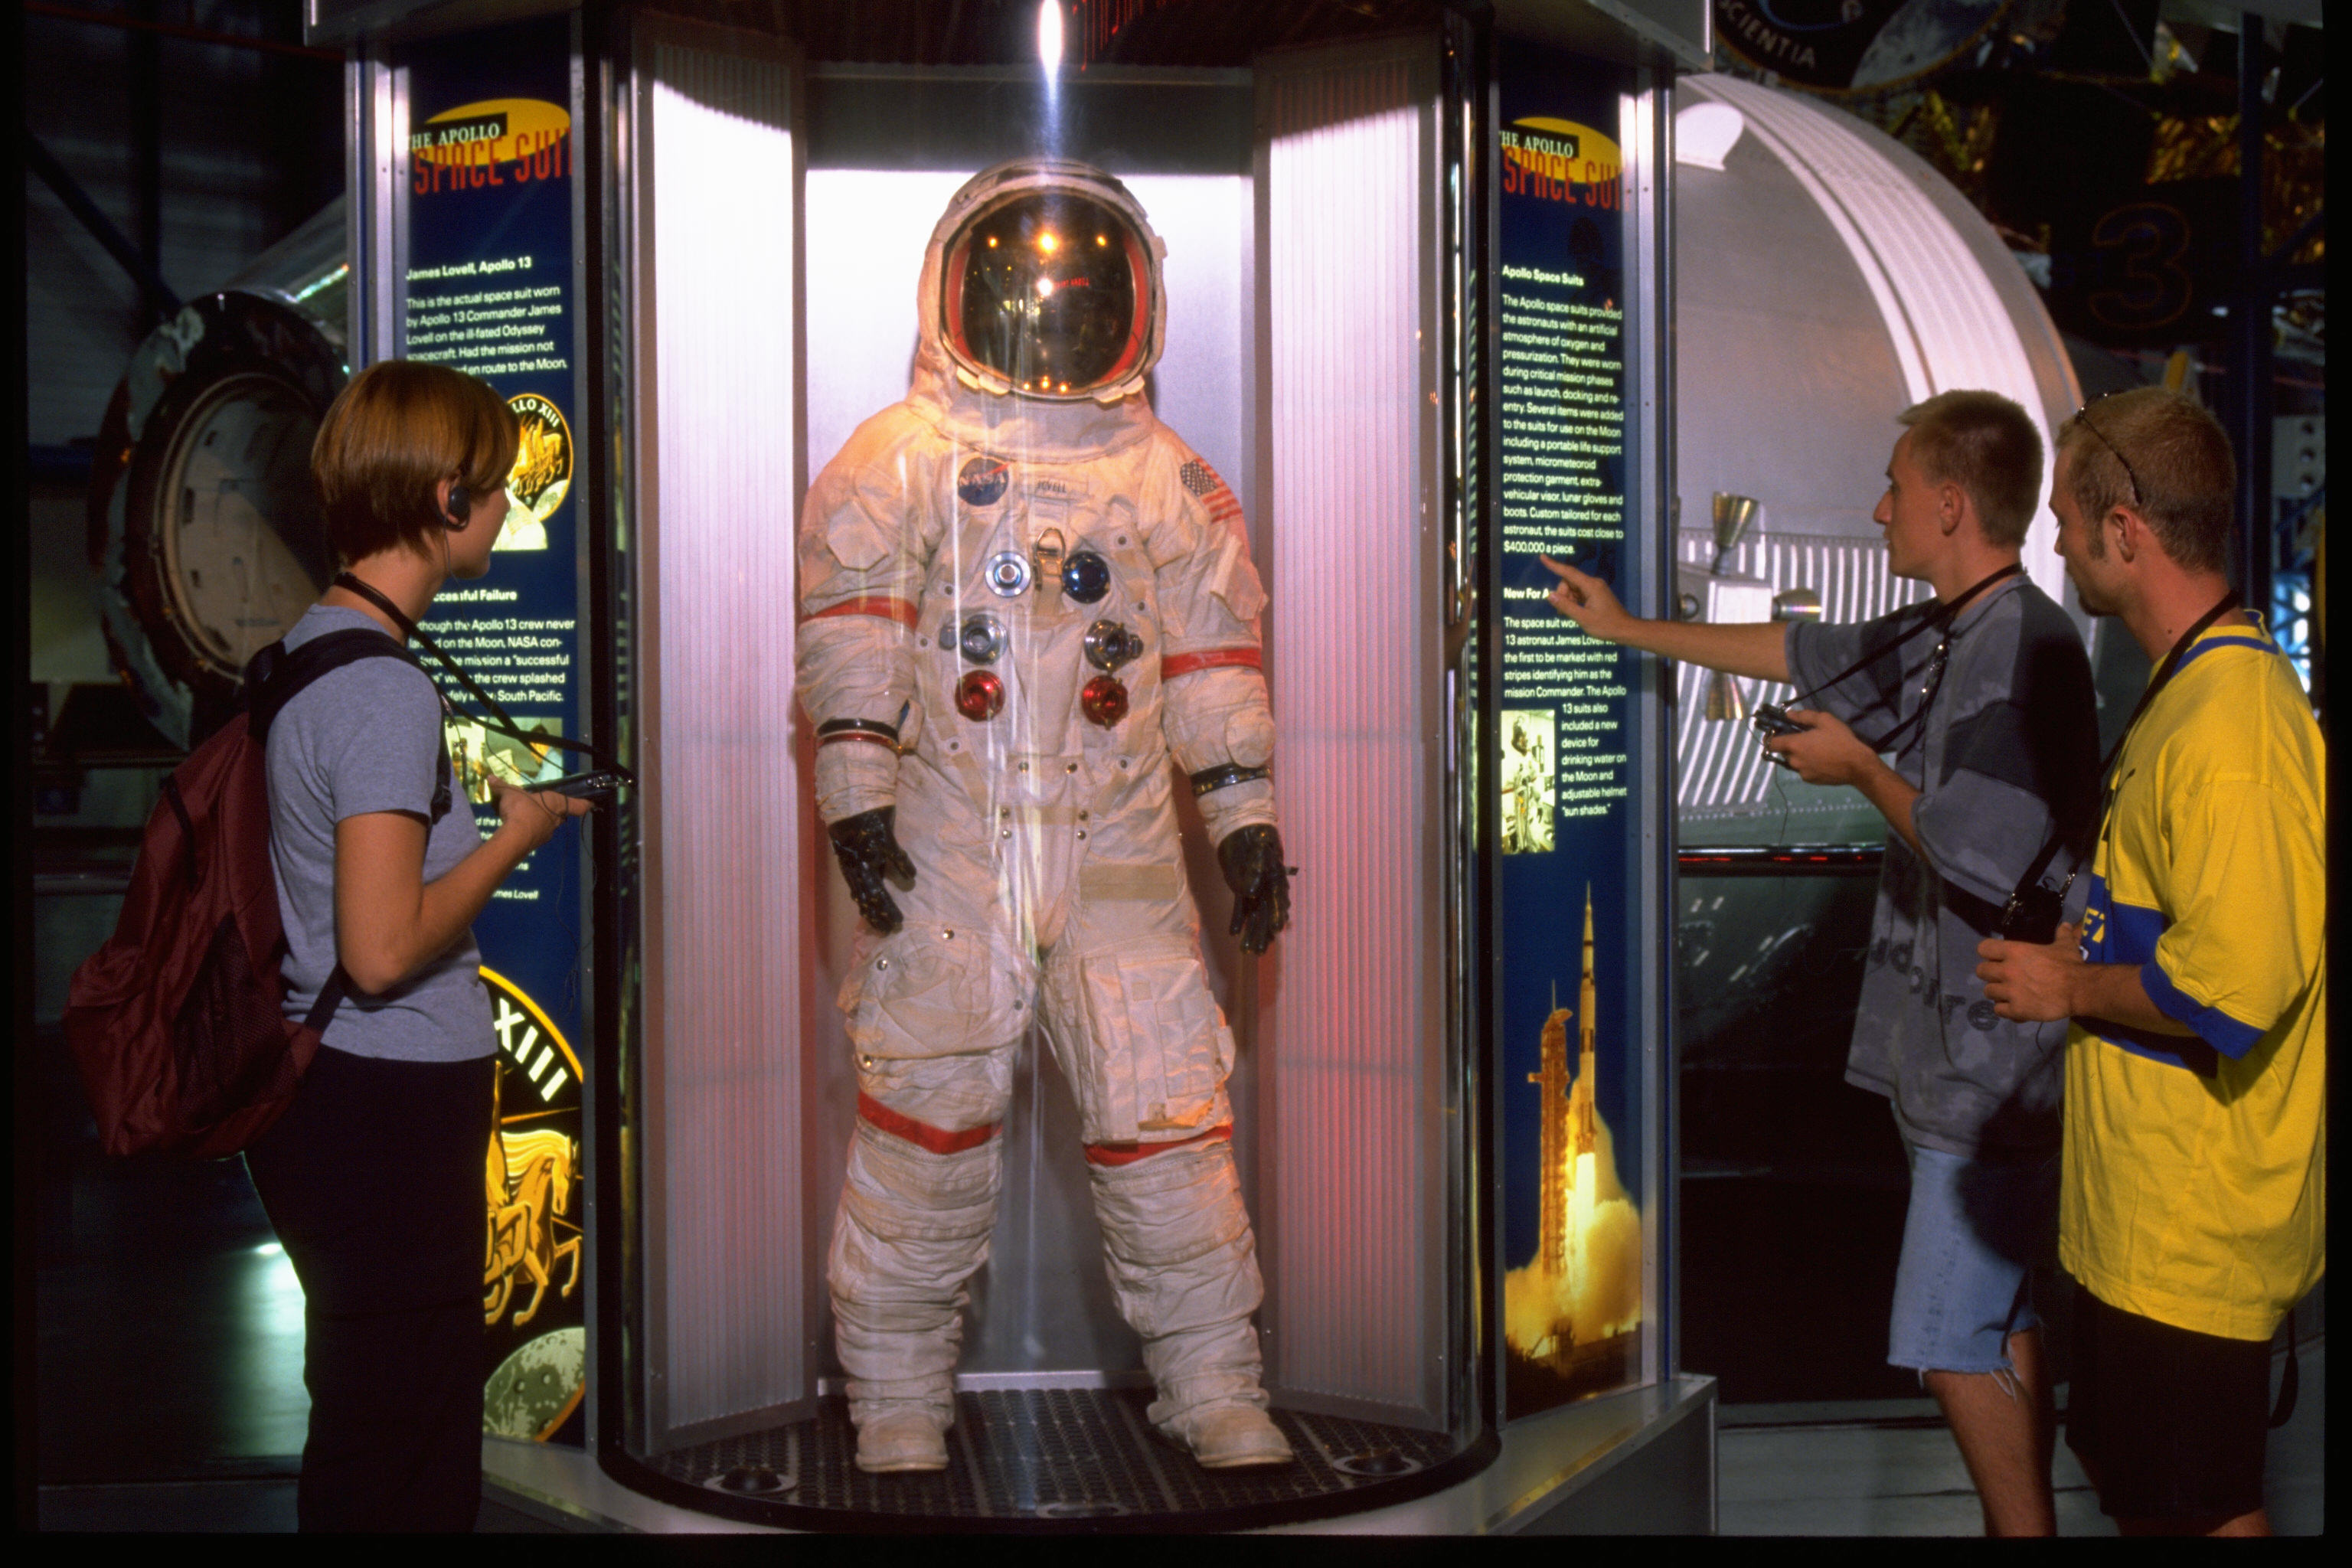 kennedy space center apollo exhibit - photo #21